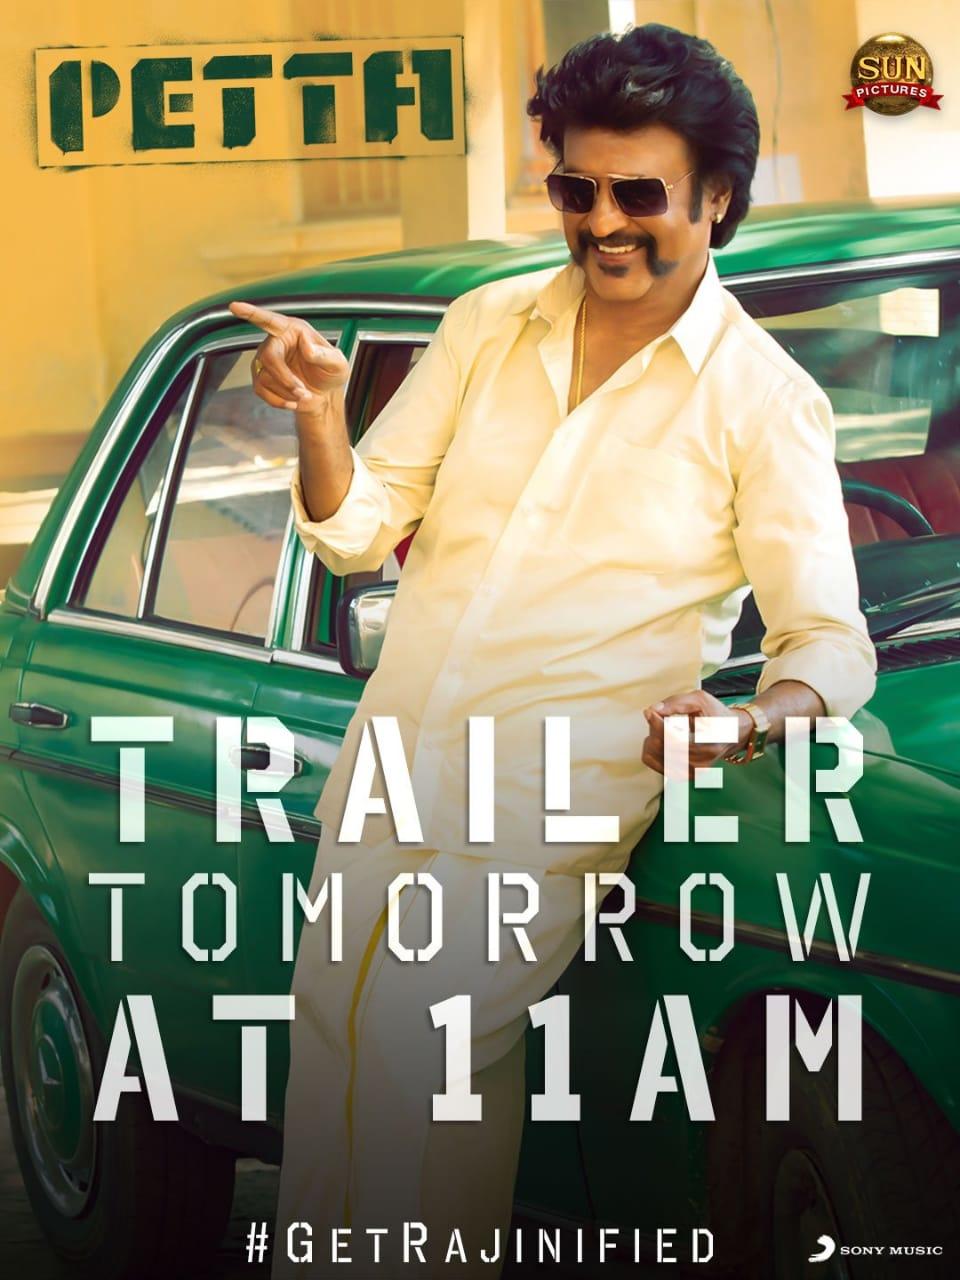 Petta Movie Trailer Tomorrow At 11 Am Latest Poster Social News